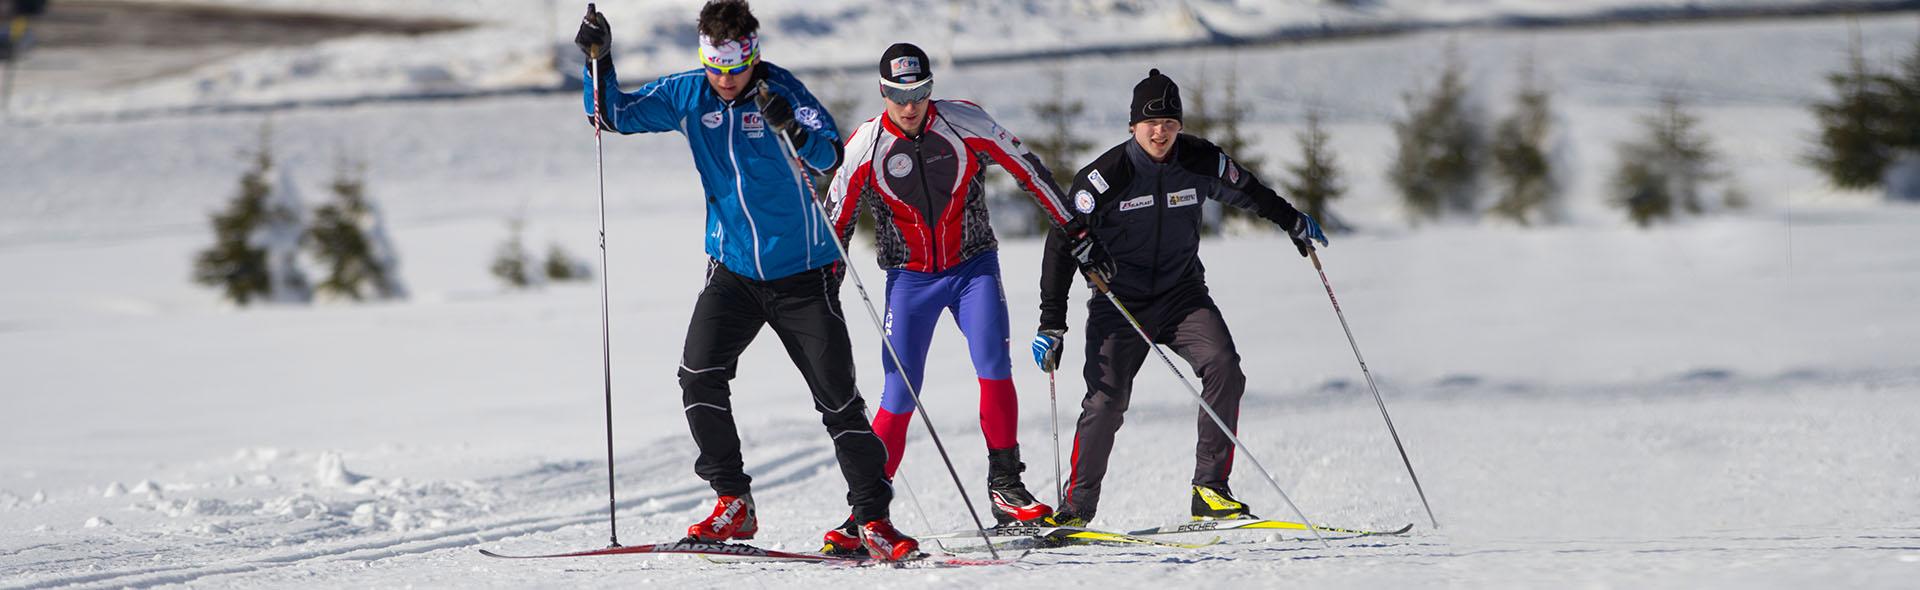 Nordic - Skilanglauf